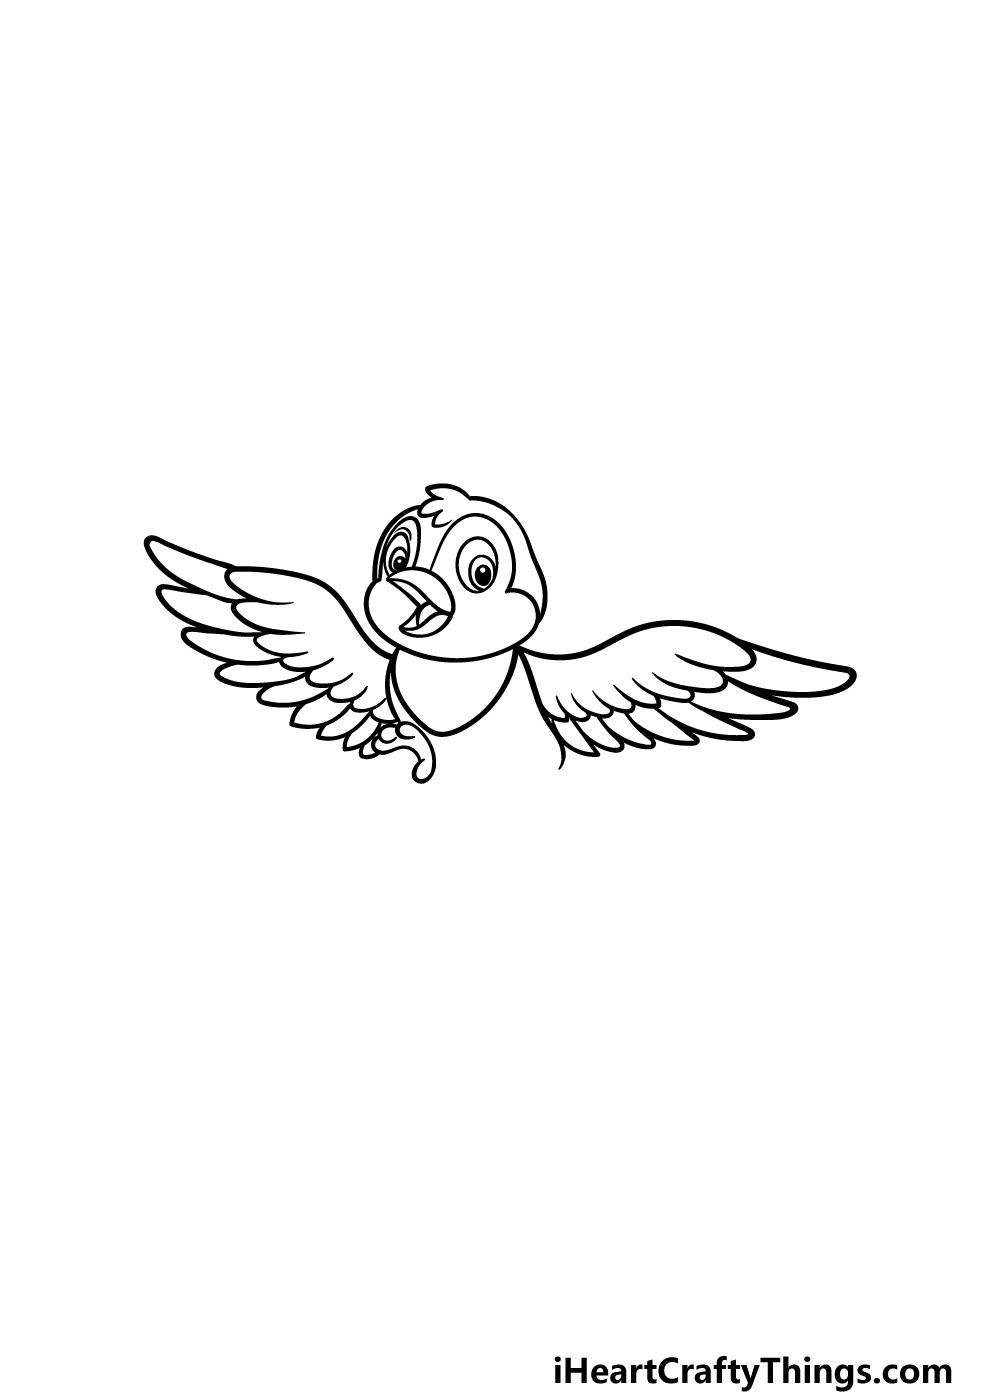 how to draw a cartoon bird step 3